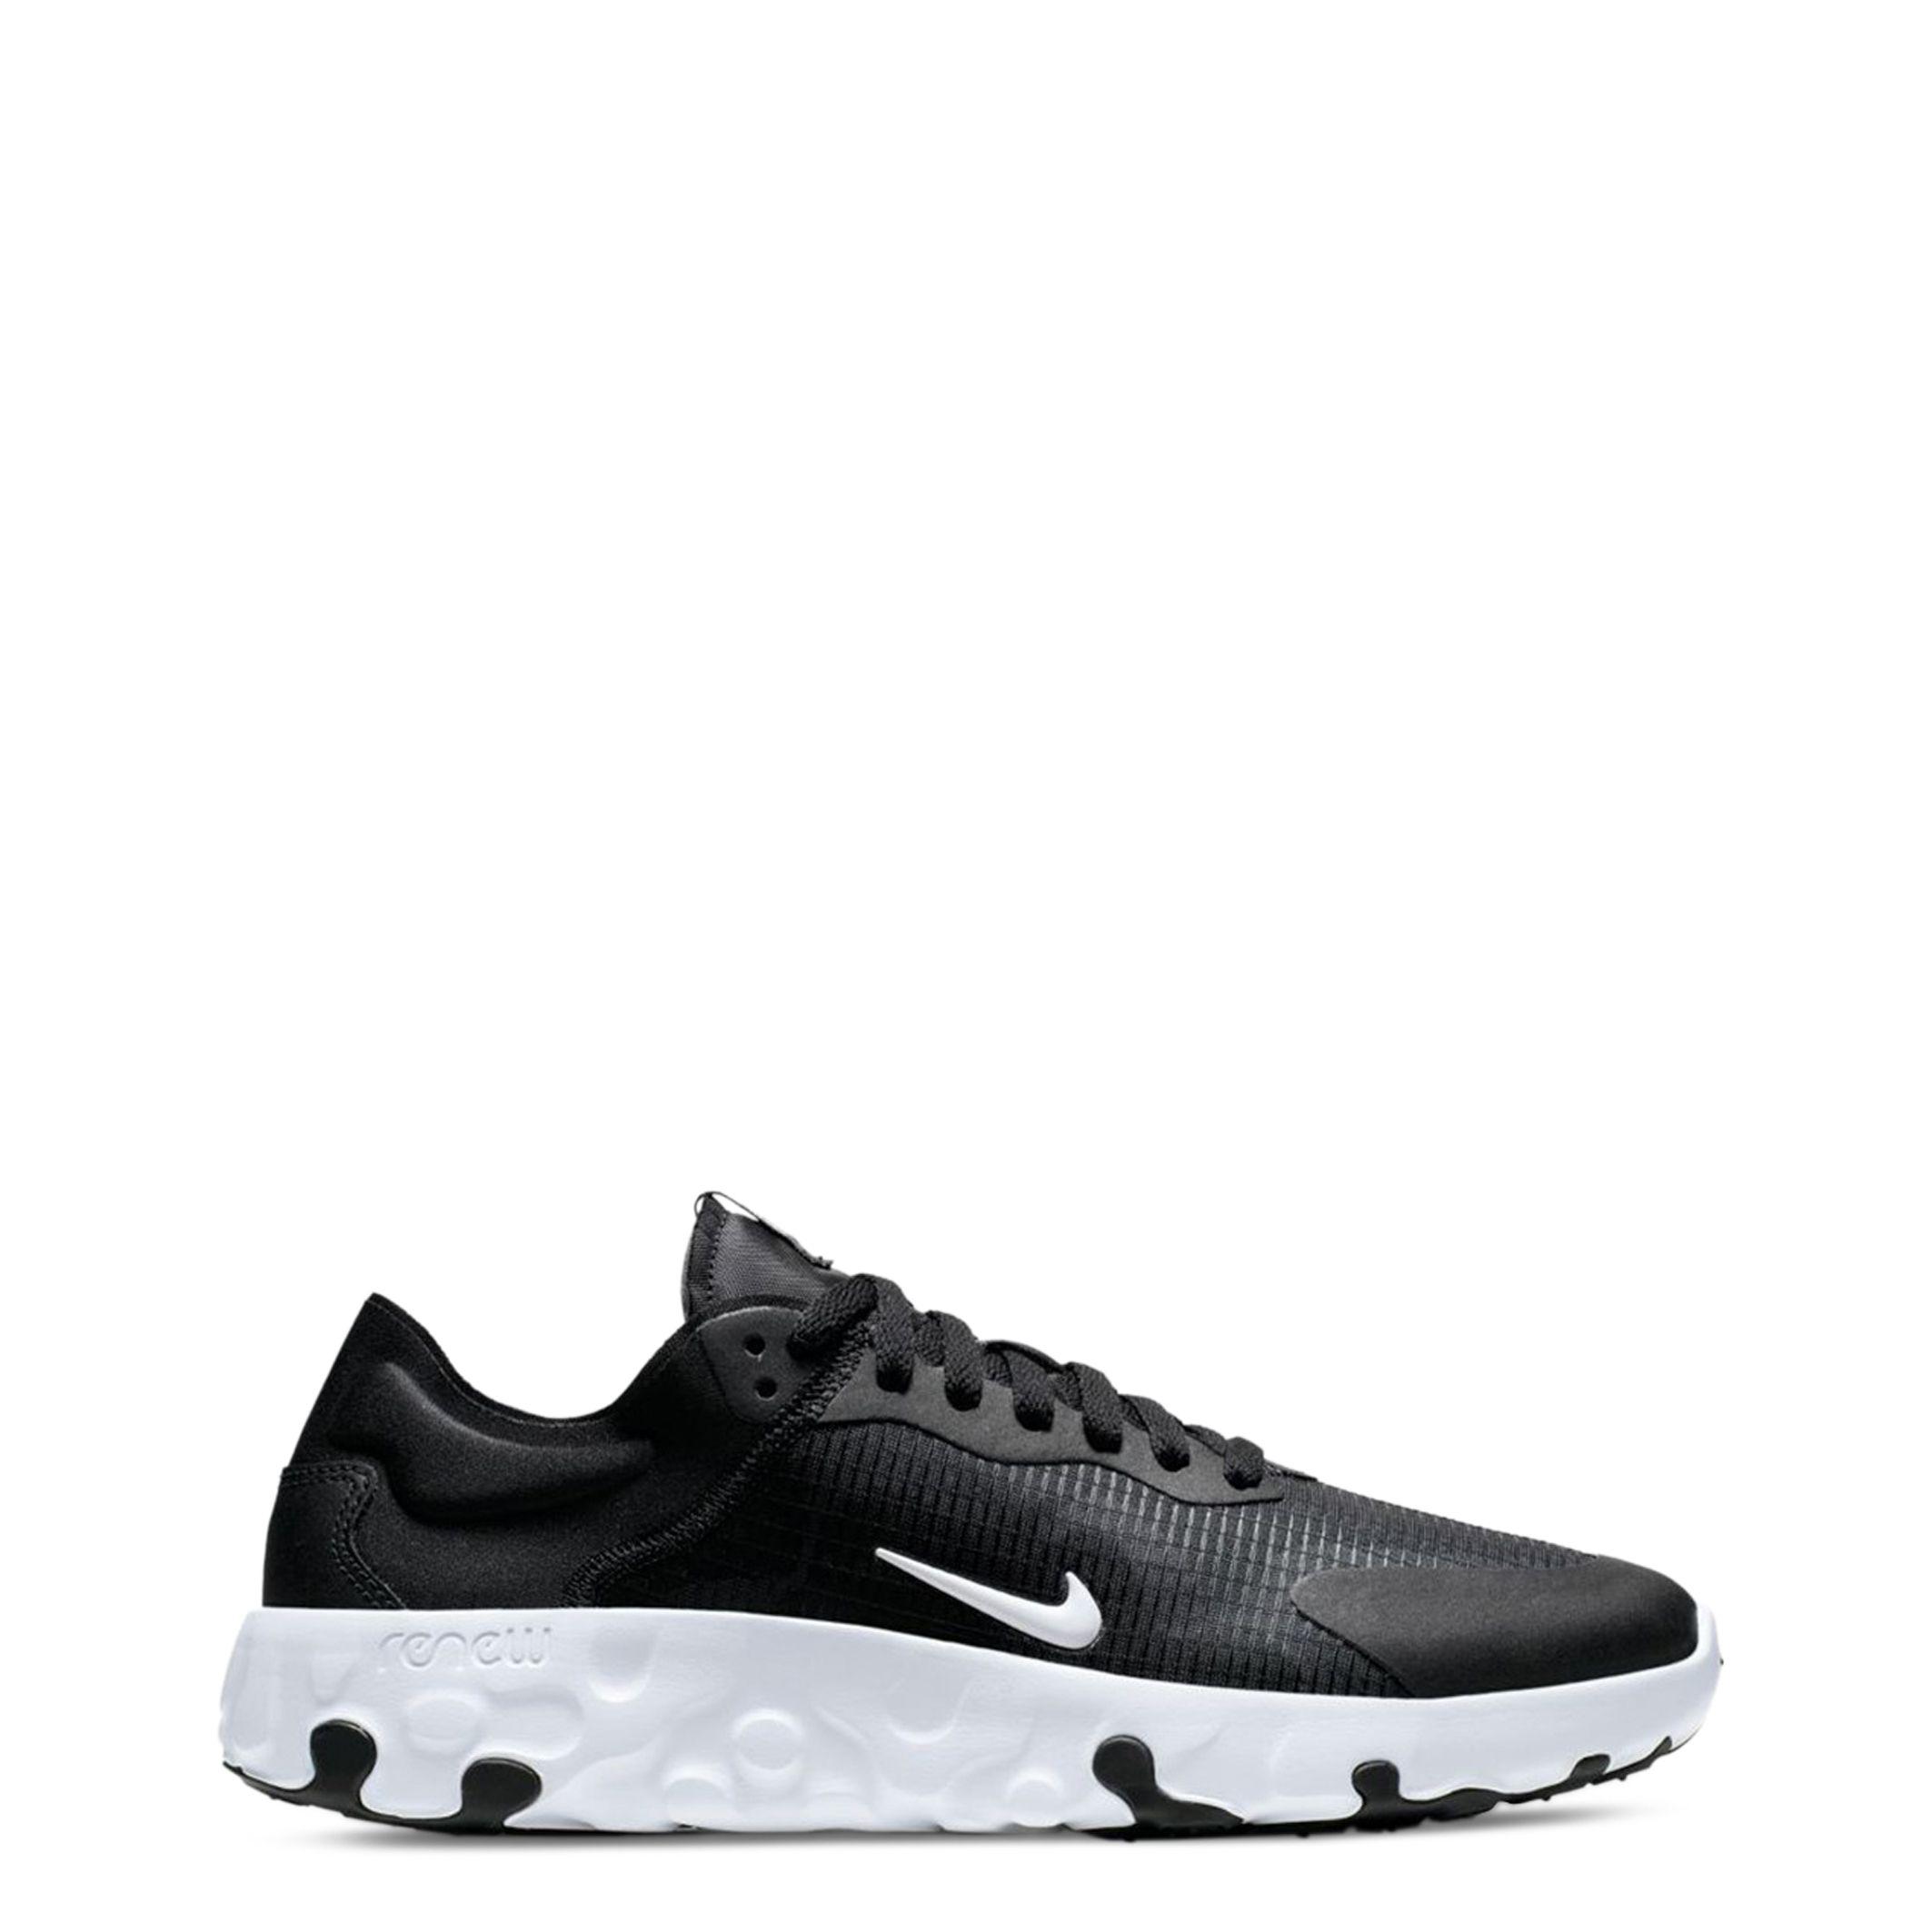 Schuhe Nike – RenewLucent-BQ4235 – Schwarz